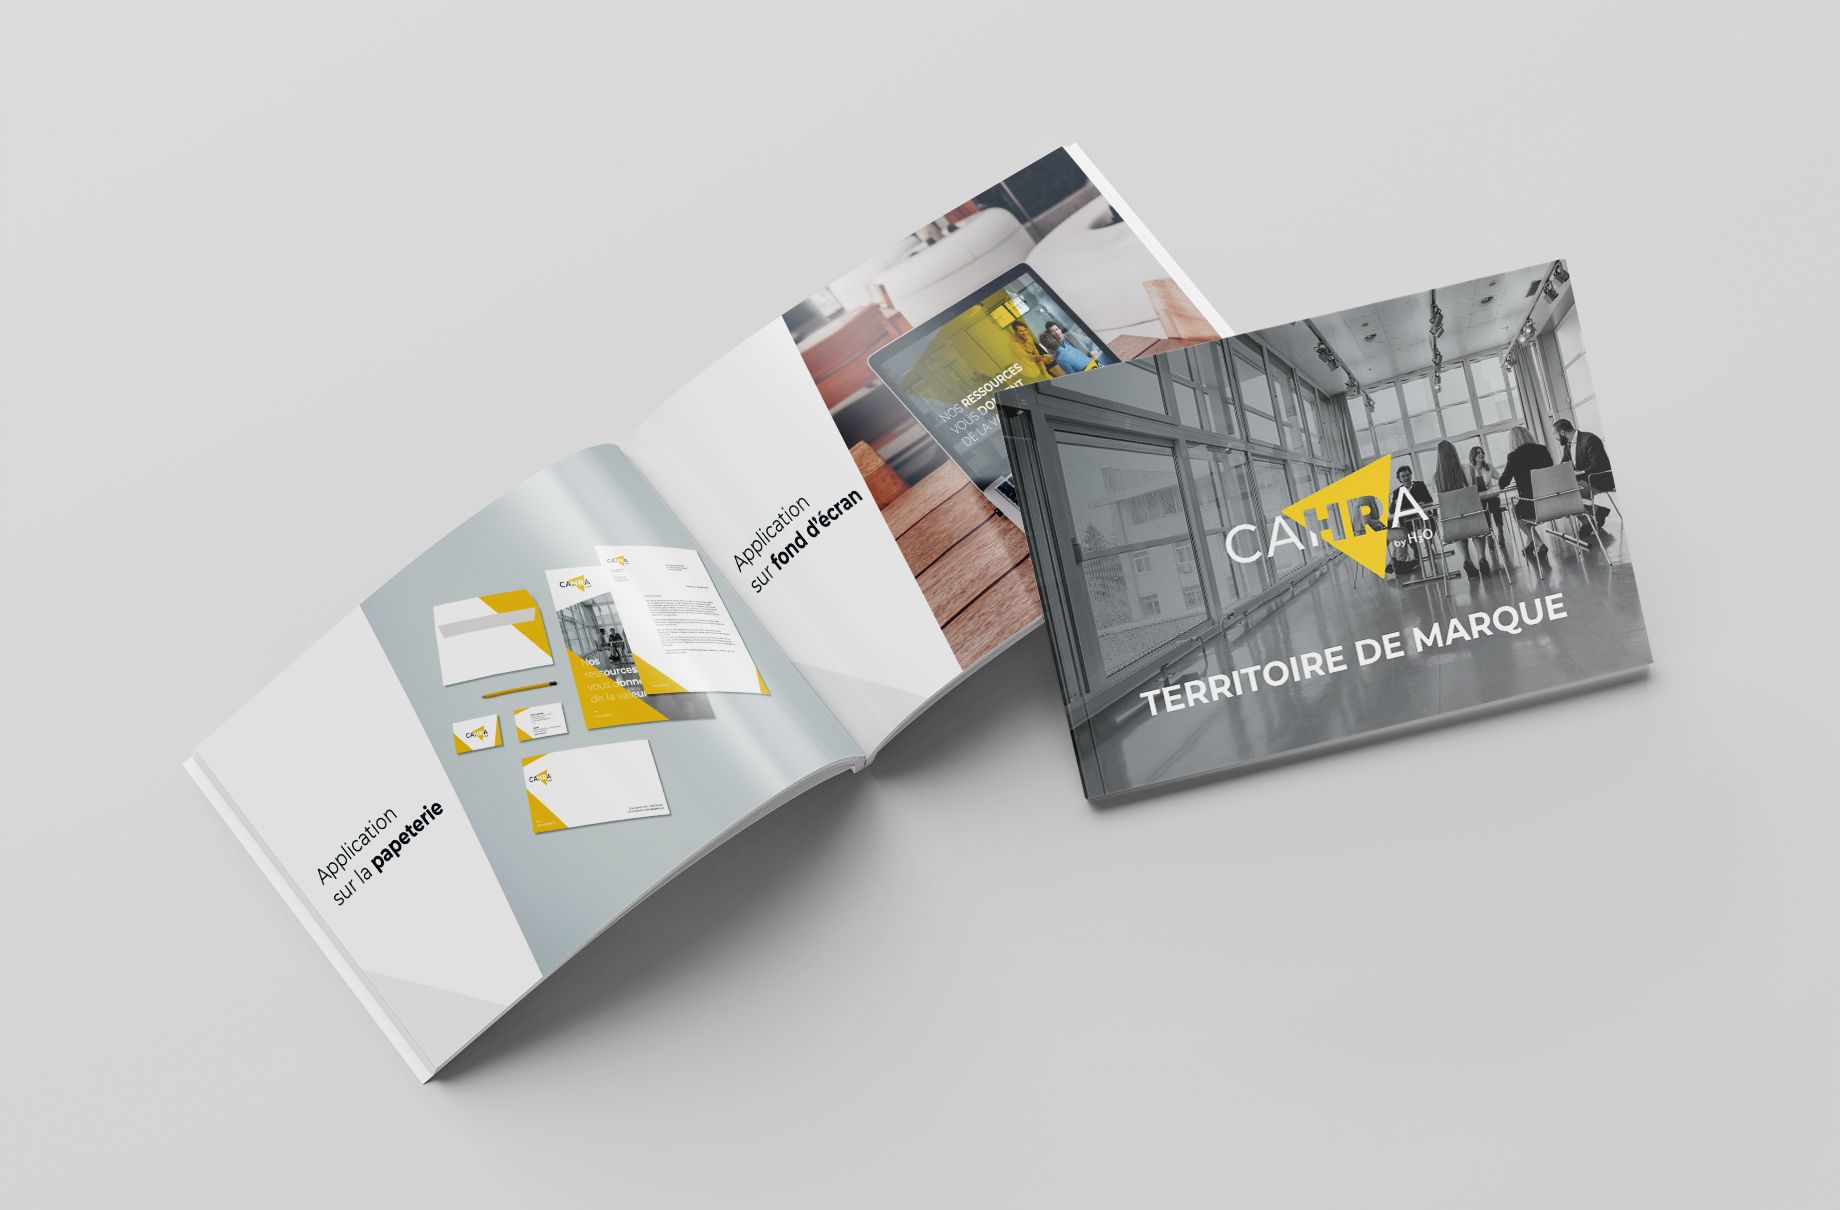 catalogue-cahra